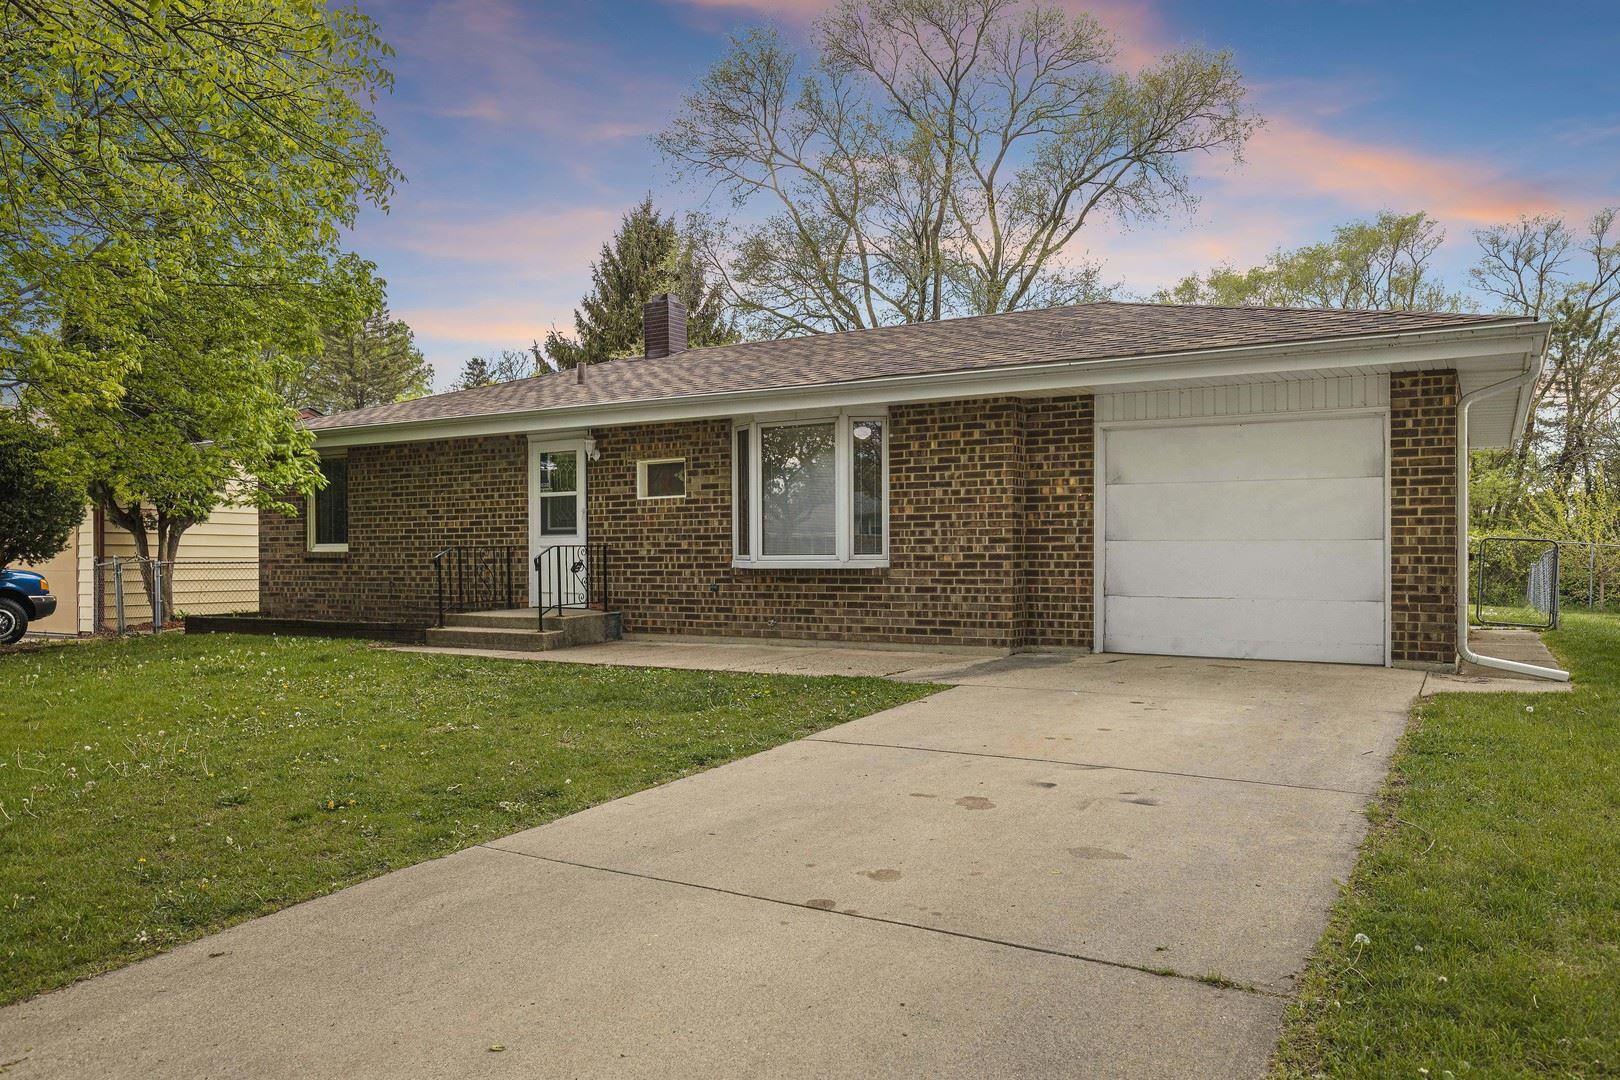 3351 Tannenbaum Lane, Rockford, IL 61109 - #: 11081269